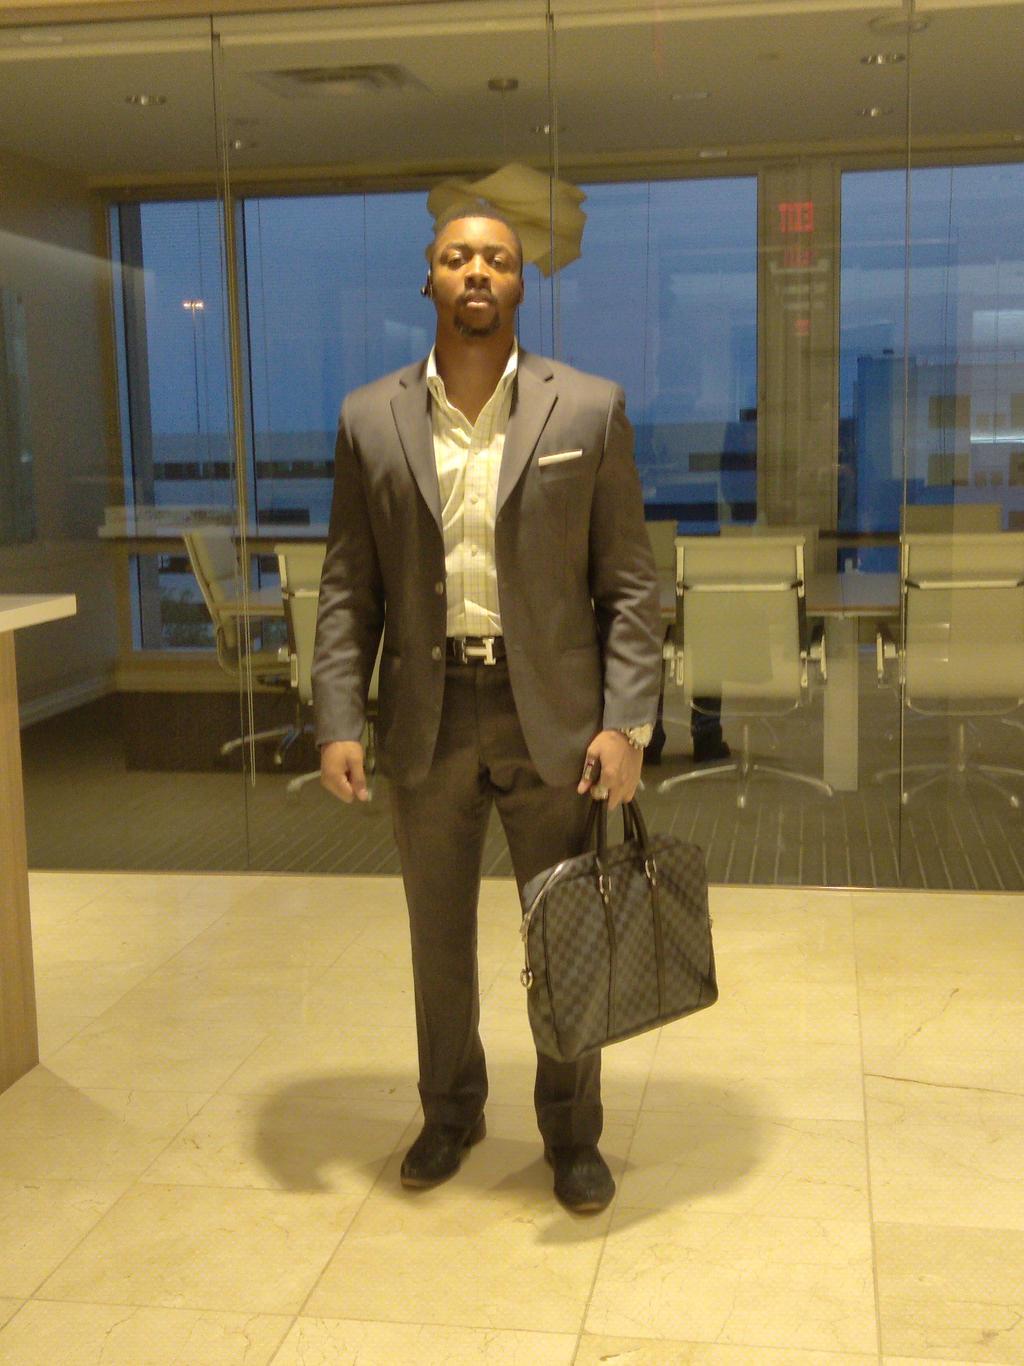 Vaughn Bell Businessman Male Model in Office Space by dm25bell